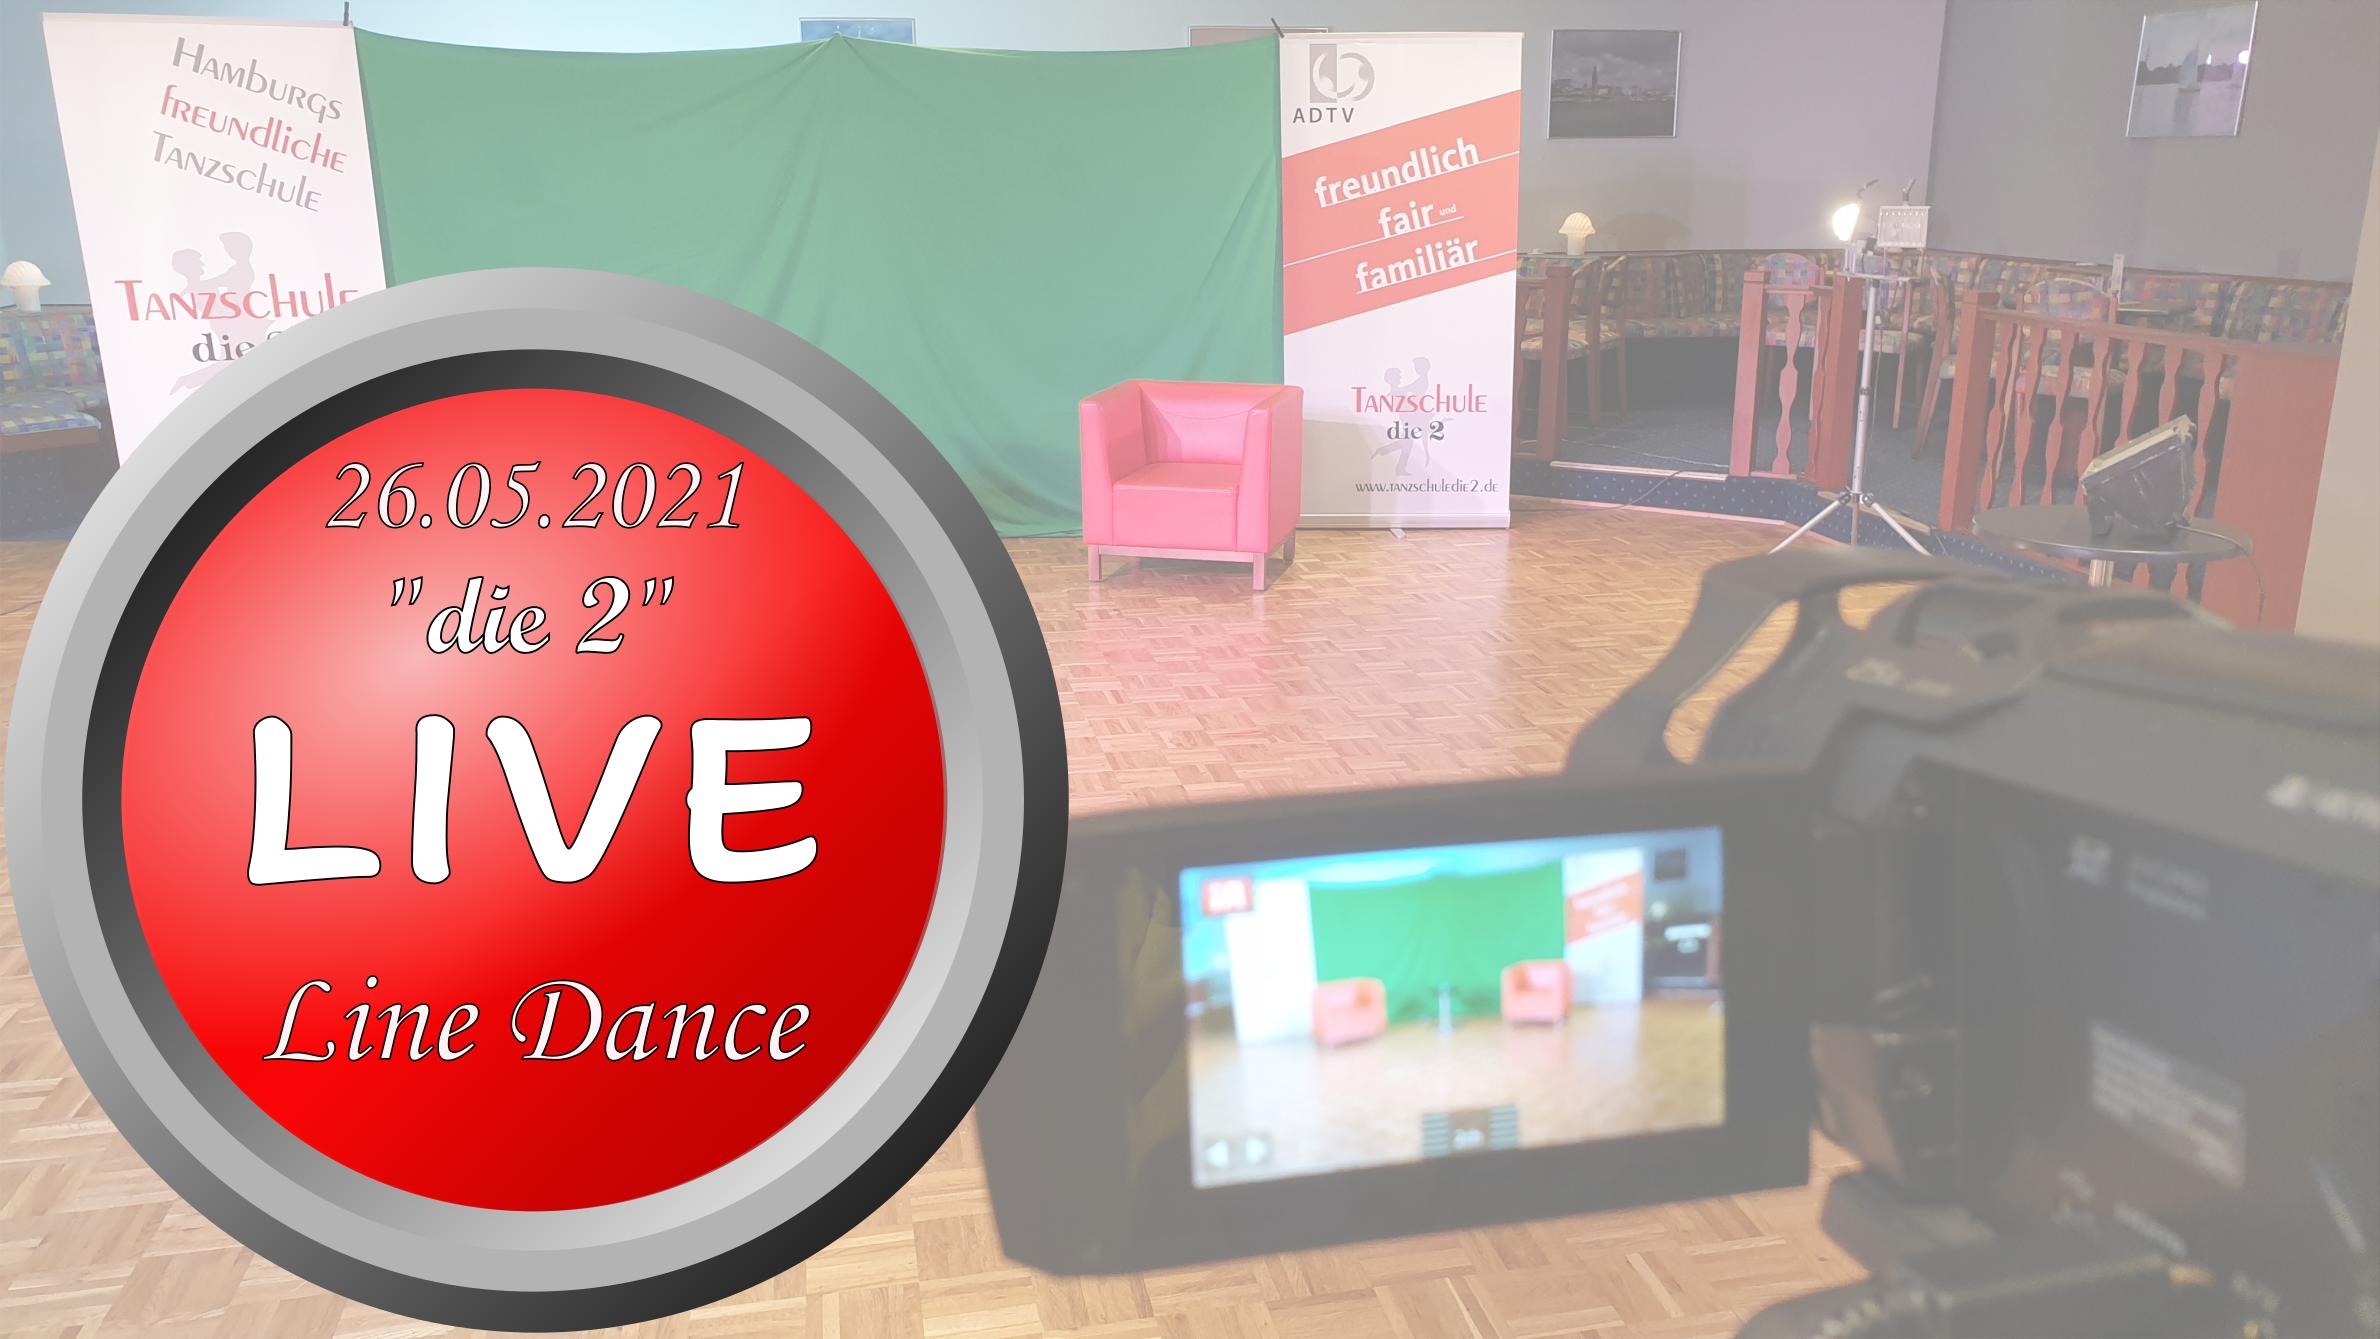 2021-05-26 Line Dance